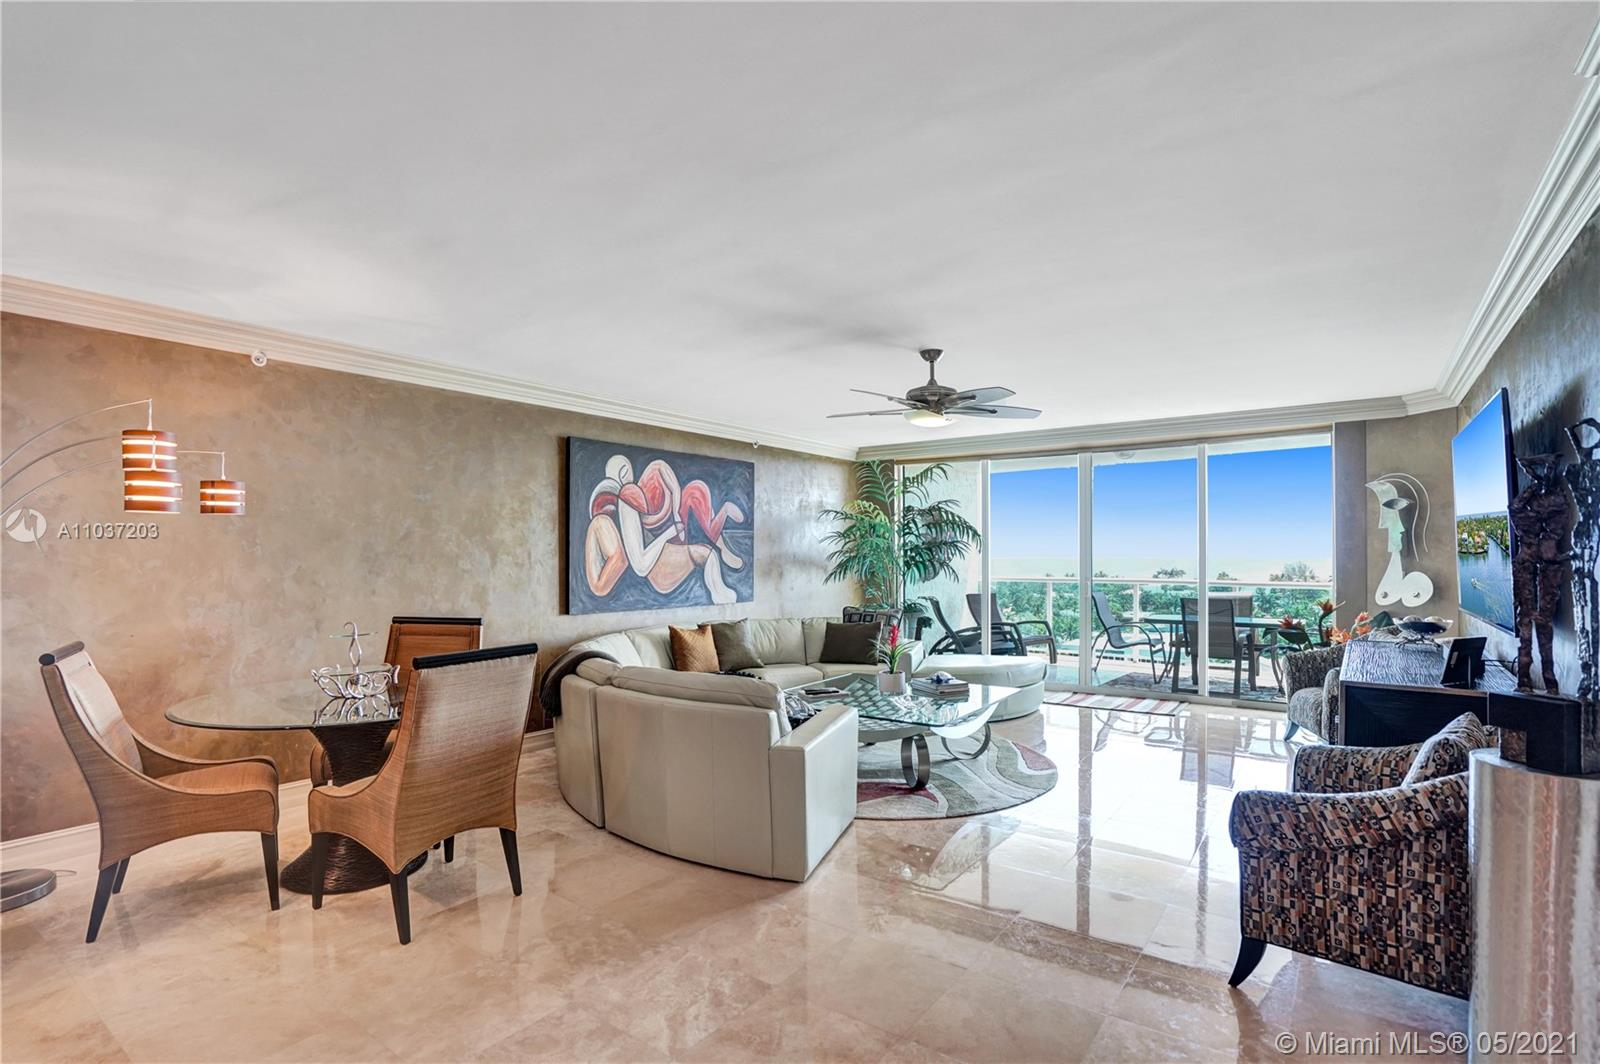 Photo of 20201 Country Club Dr #1006, Aventura, Florida, 33180 - Living room.